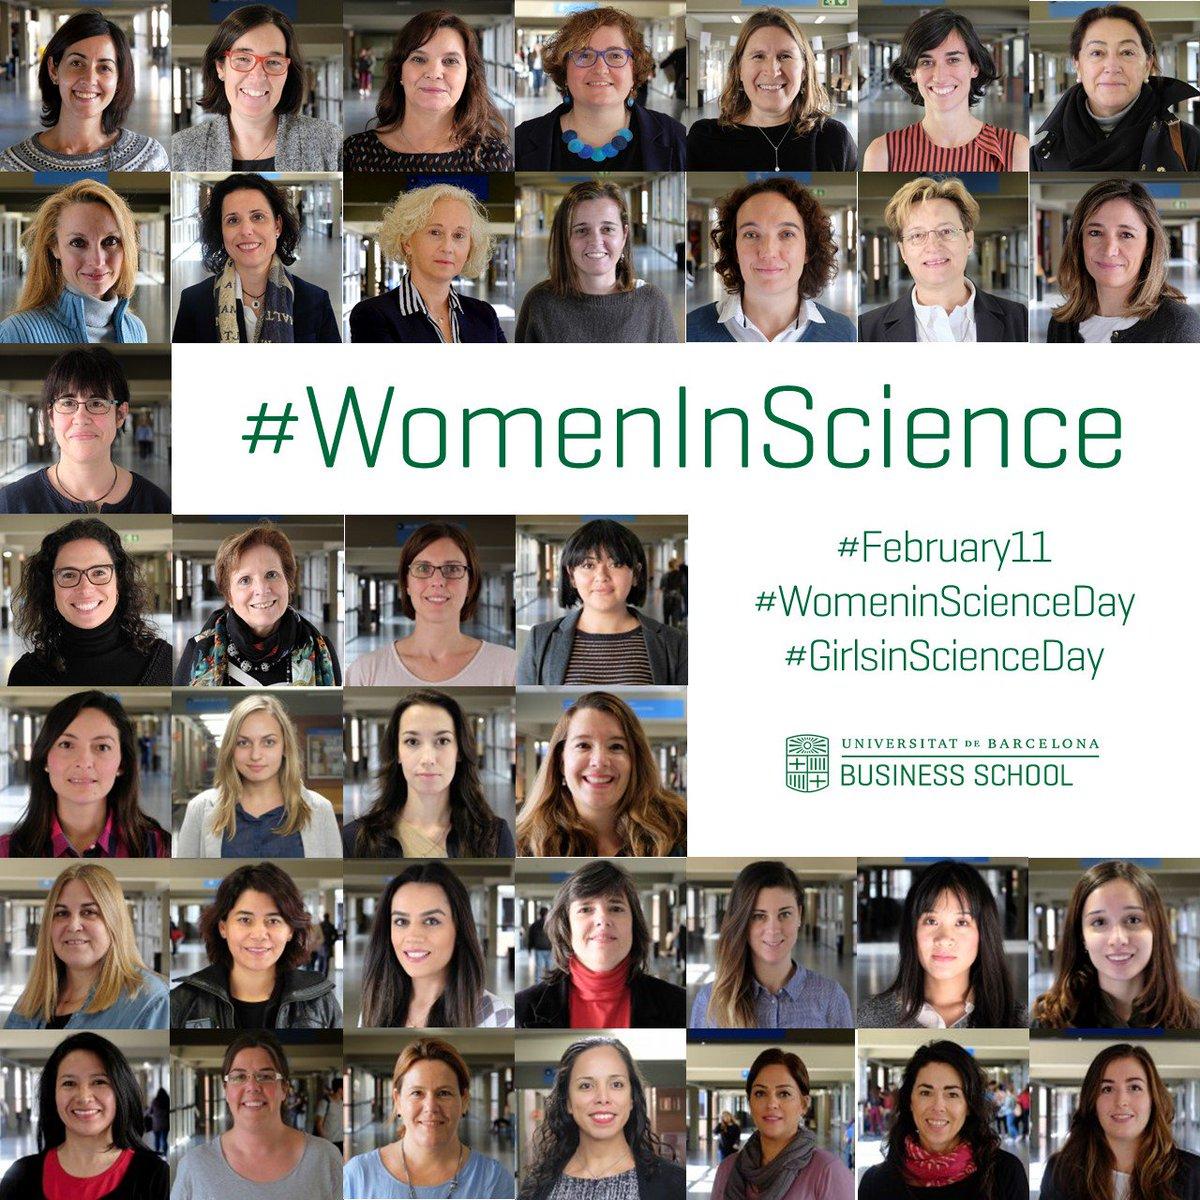 UB Business School's photo on #GirlsinScience